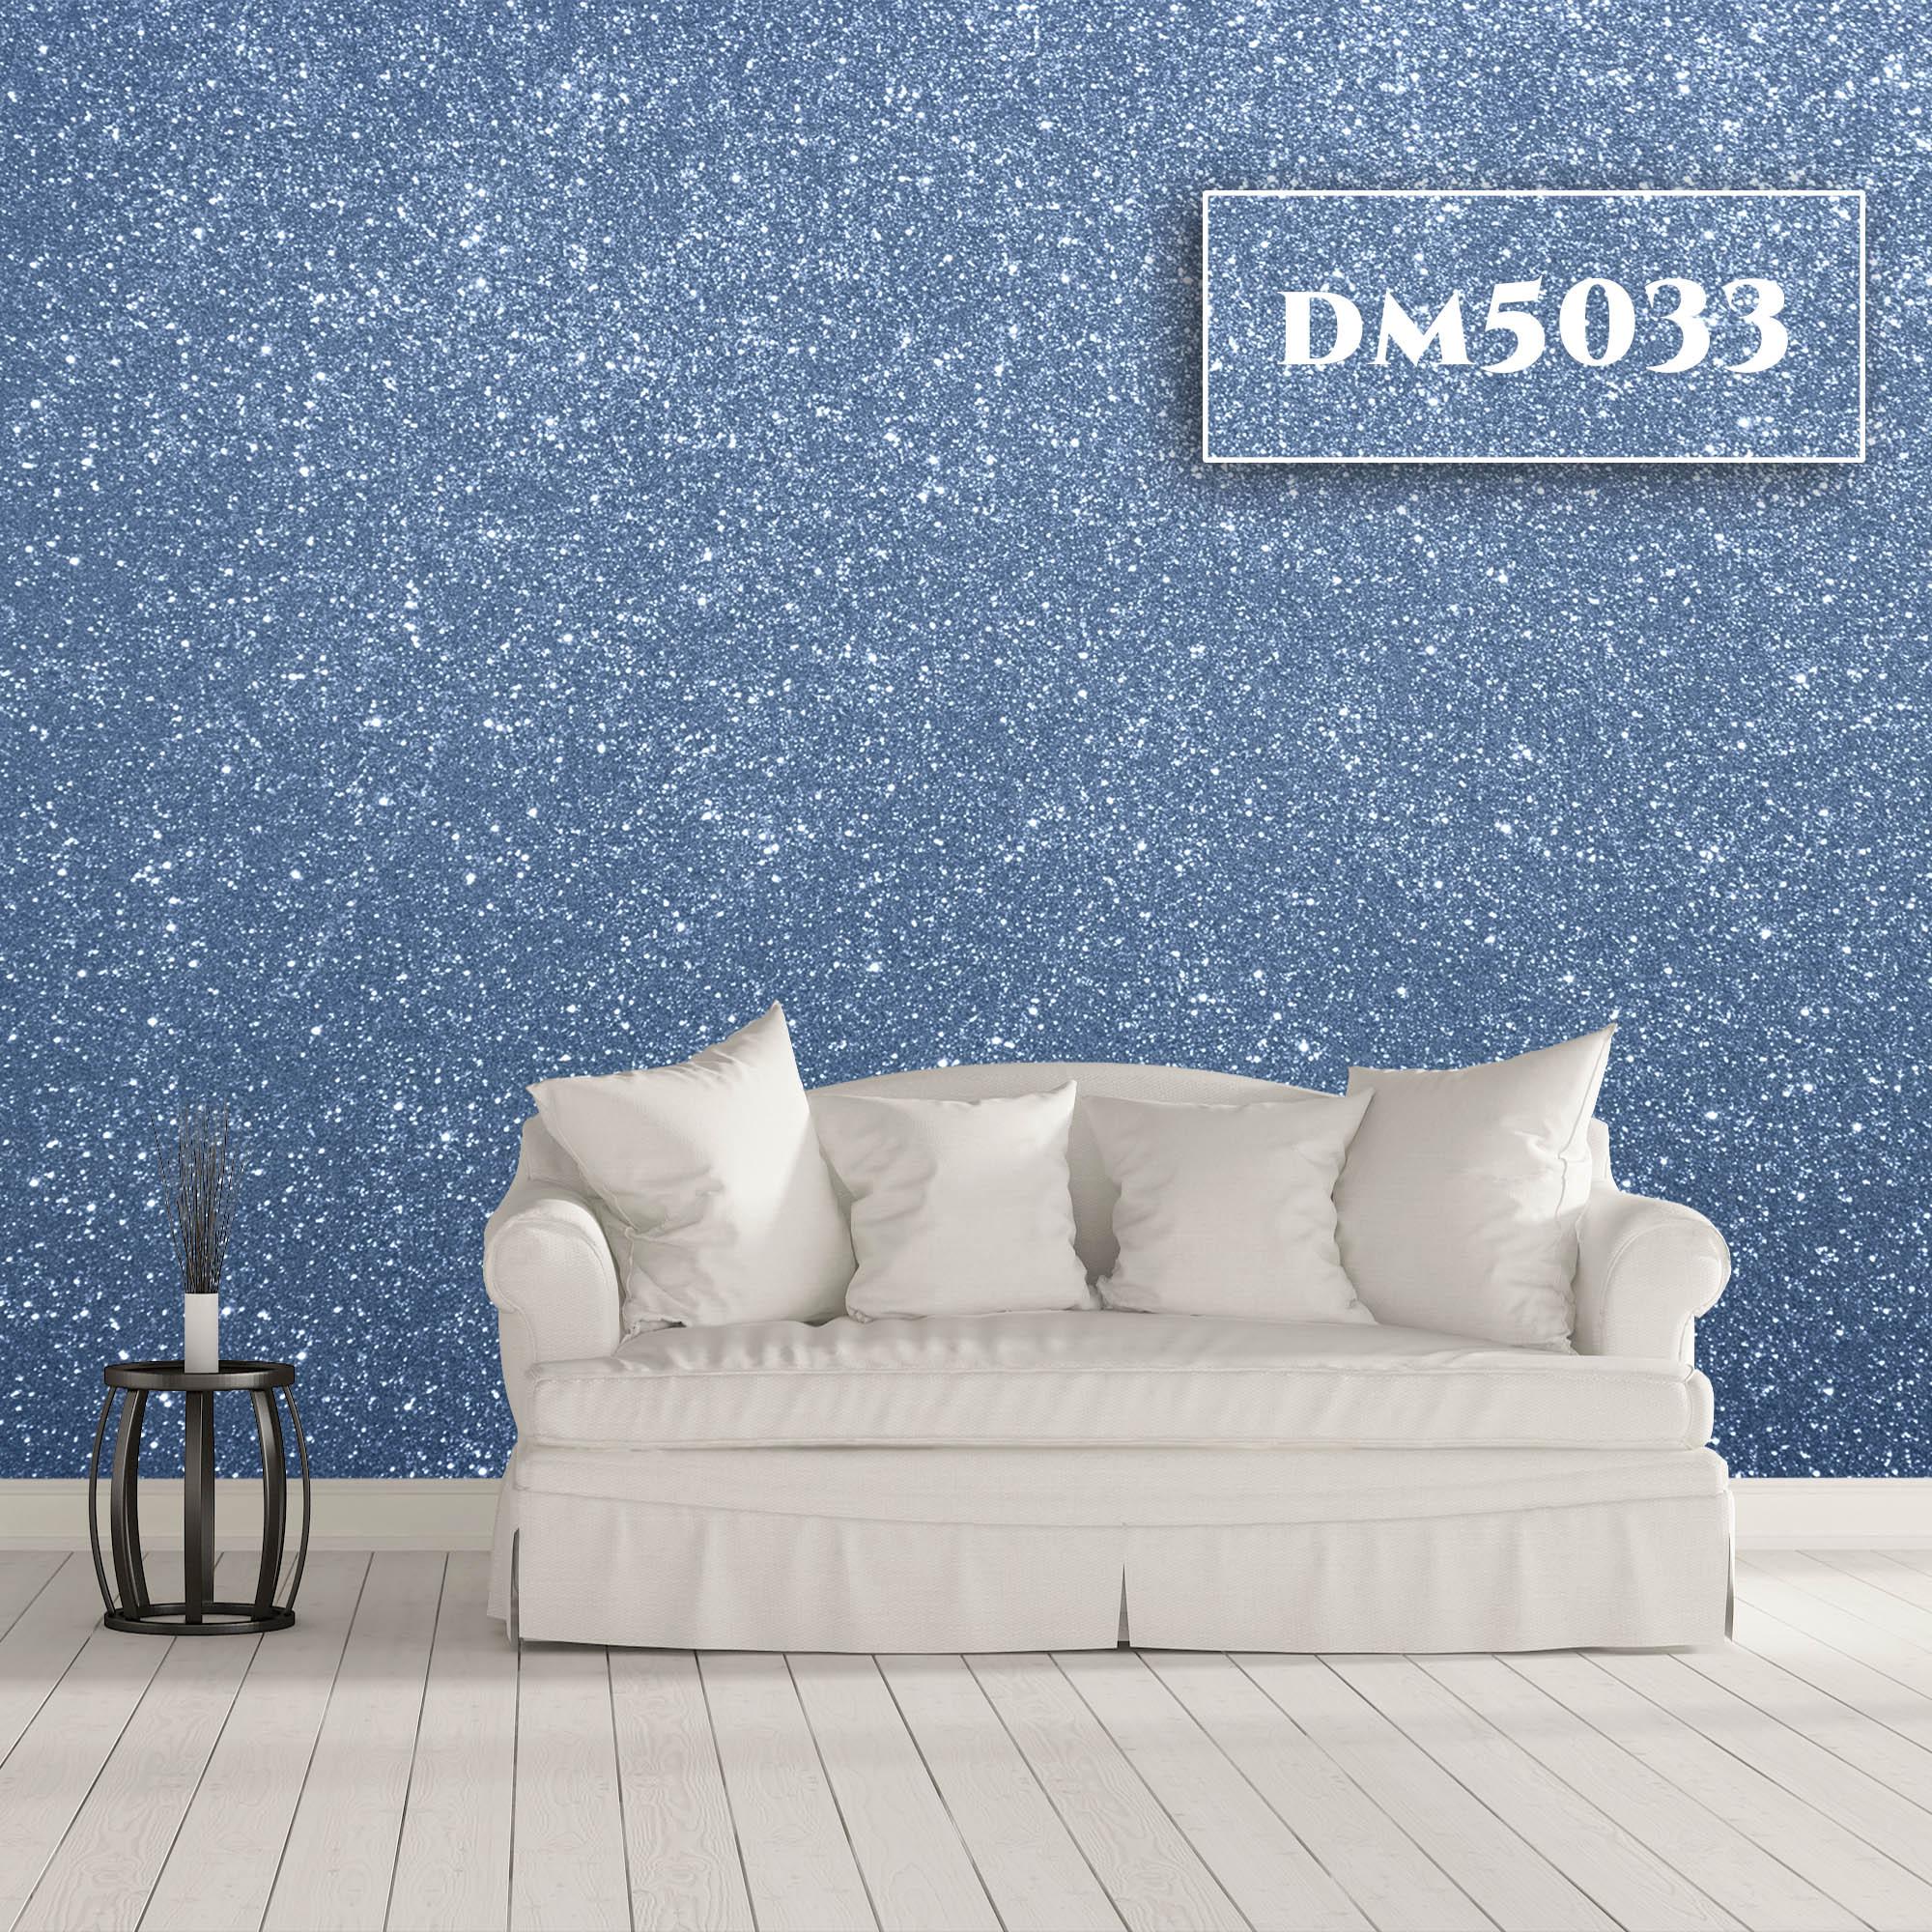 DM5033